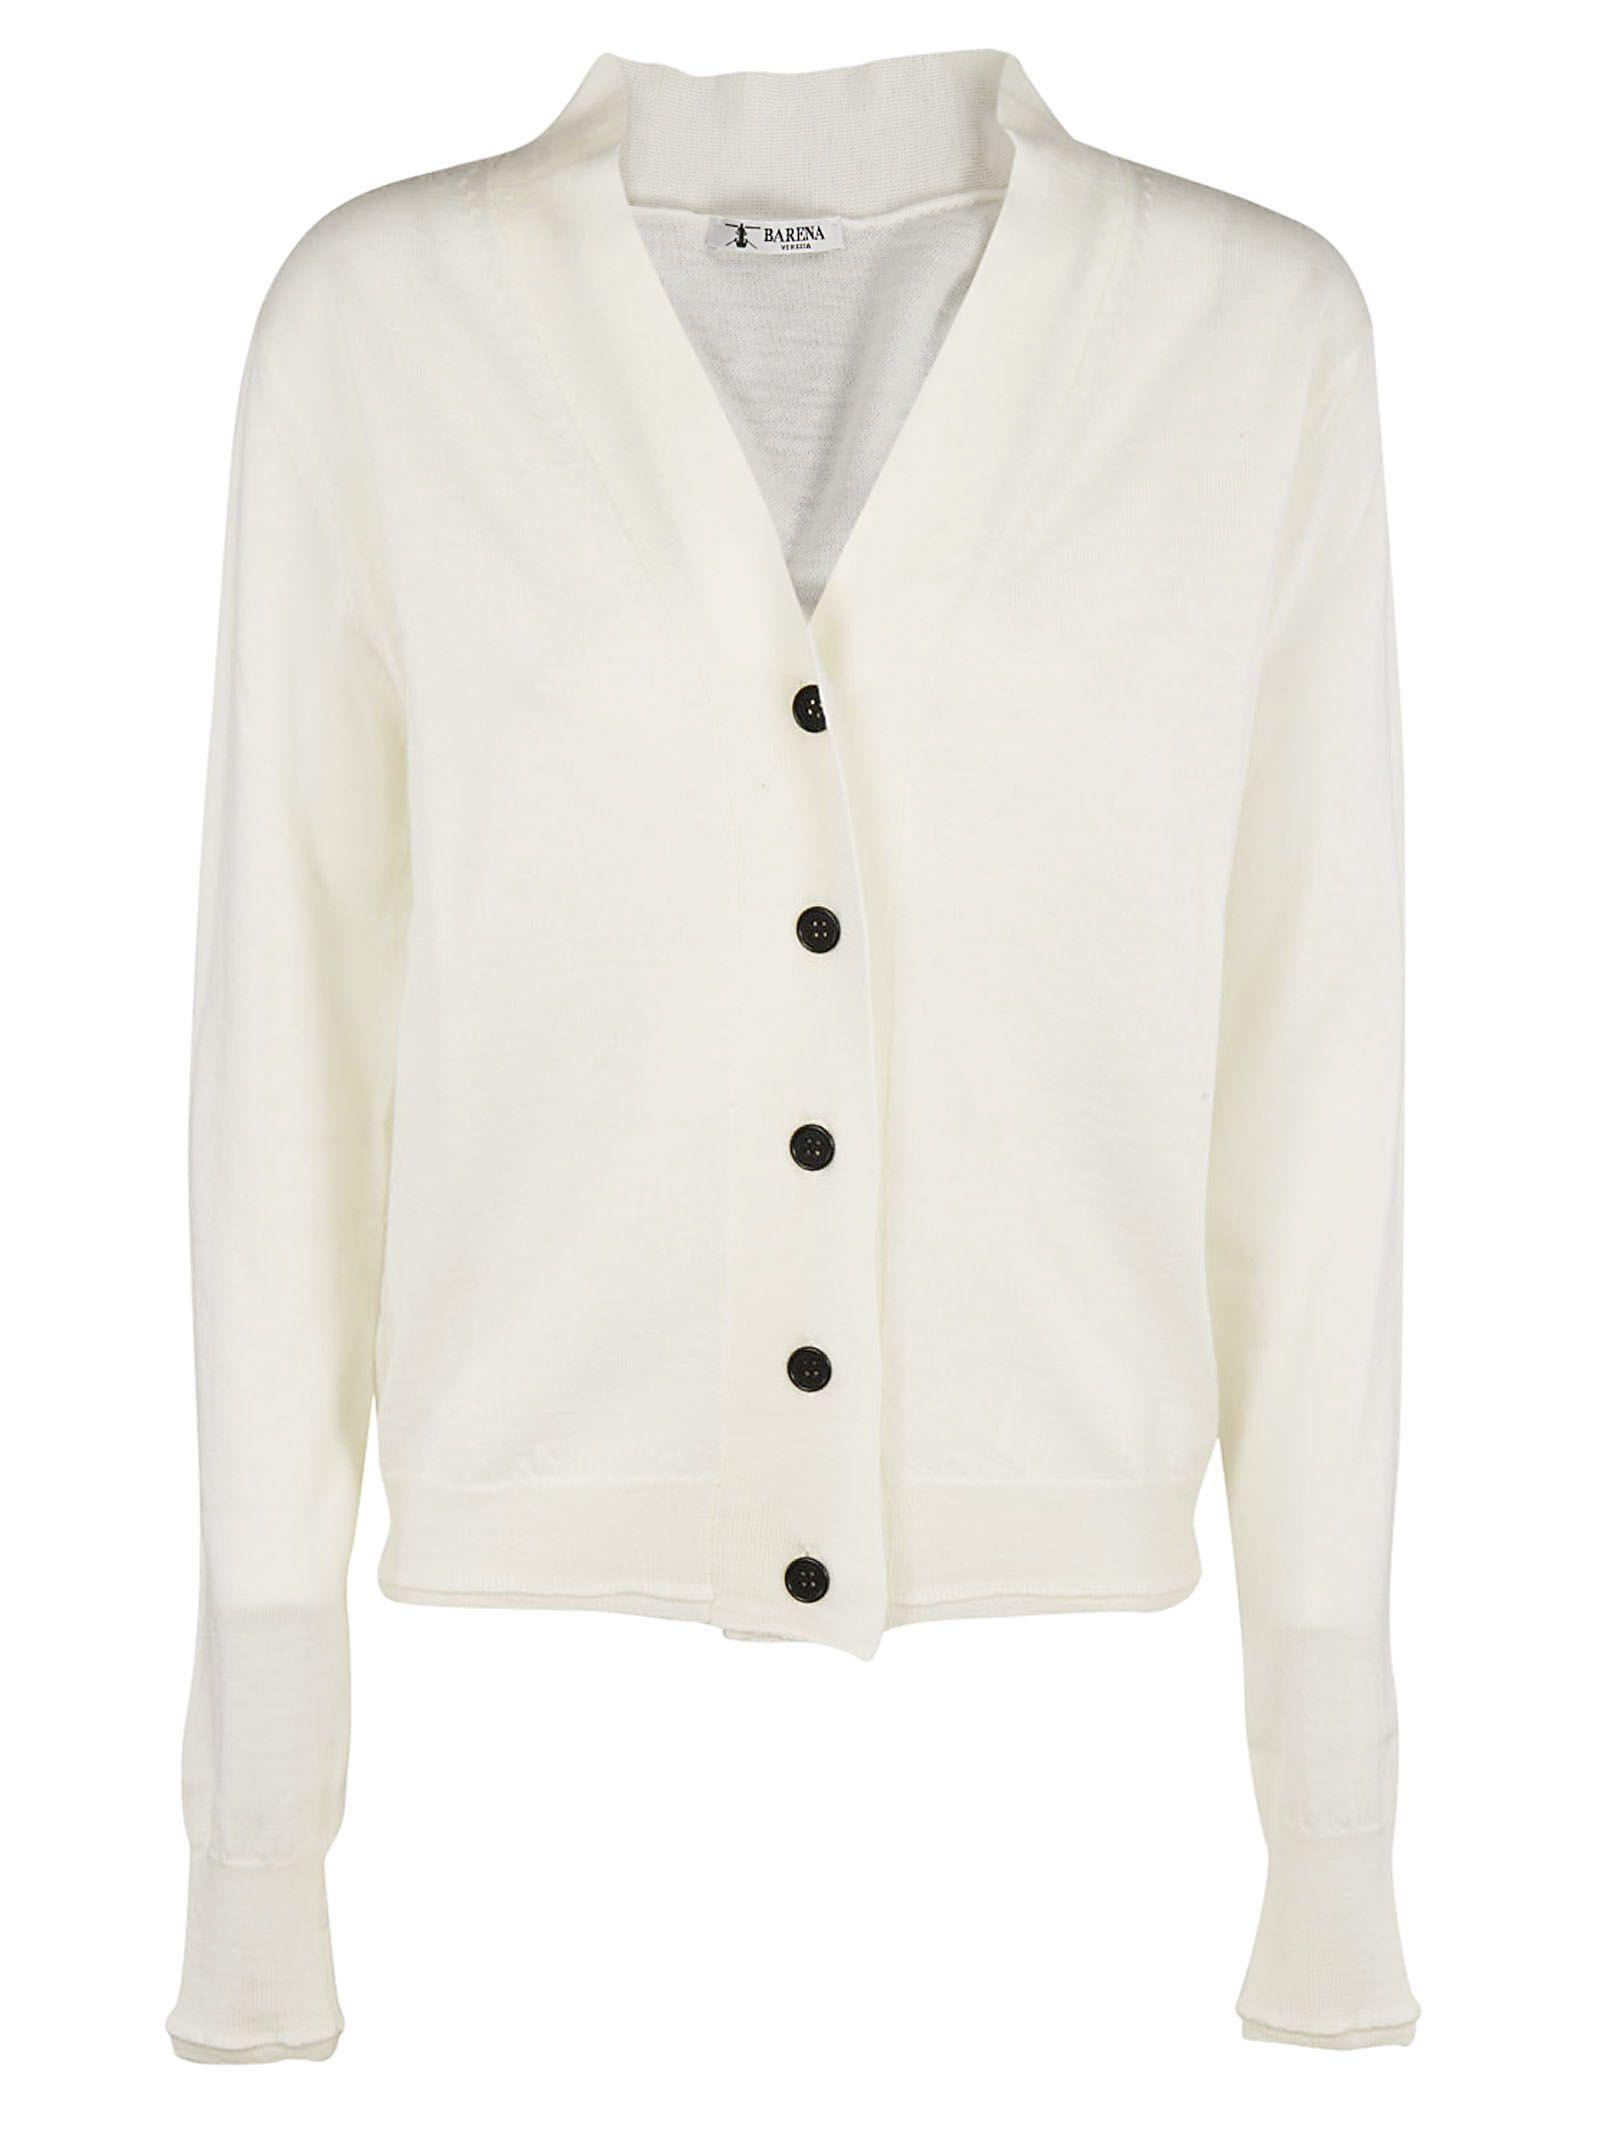 Barena - Barena Classic Cardigan - White, Women's Cardigans | Italist